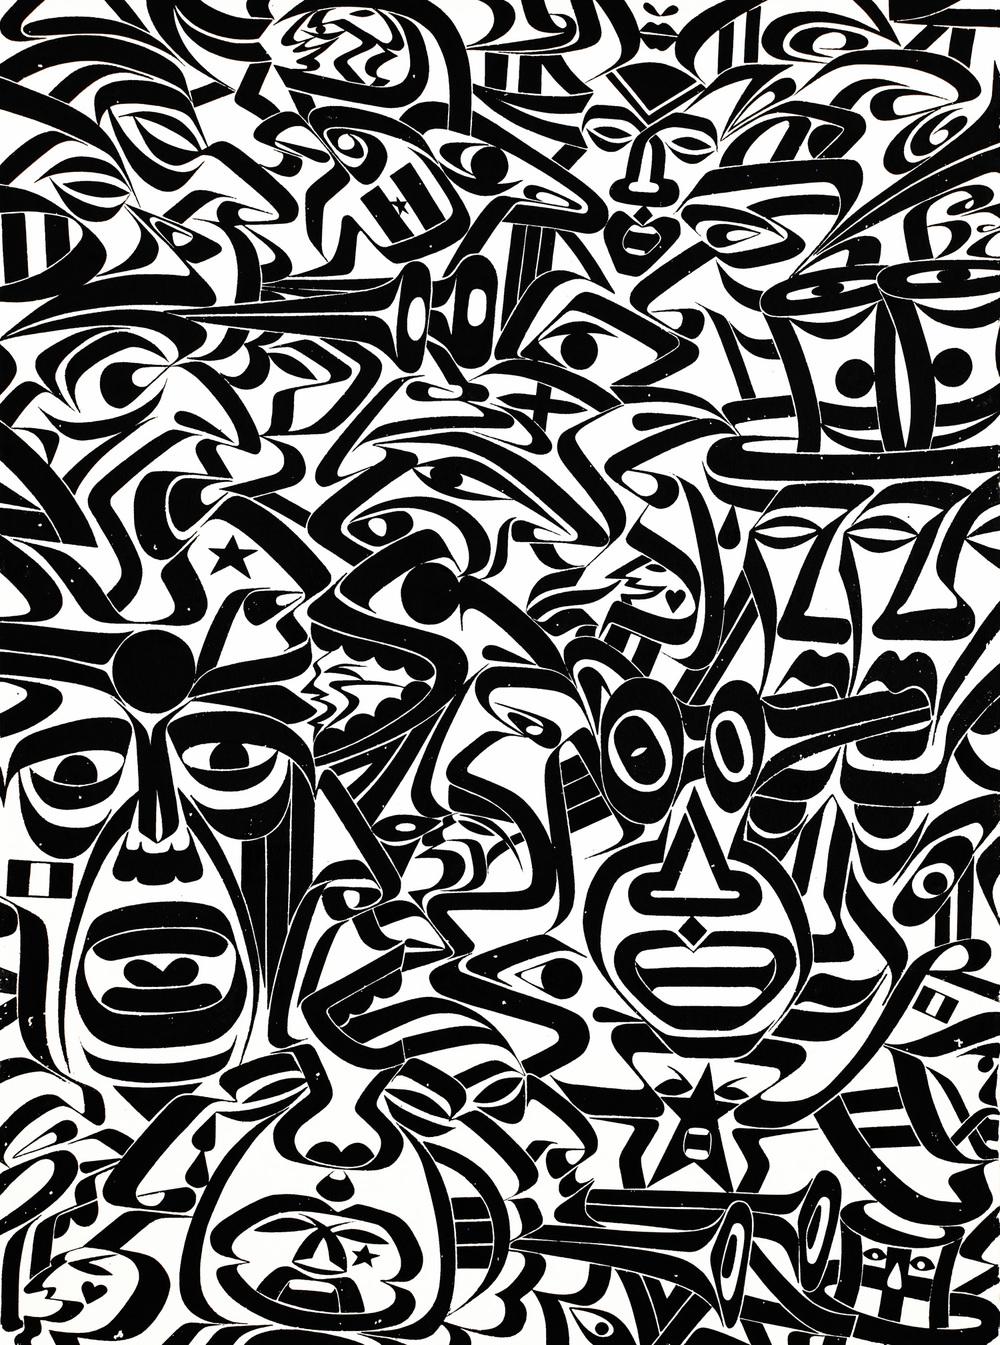 Ikonoclysm Fanatix, 2012 sumi ink on handmade paper 30 x 22 inch